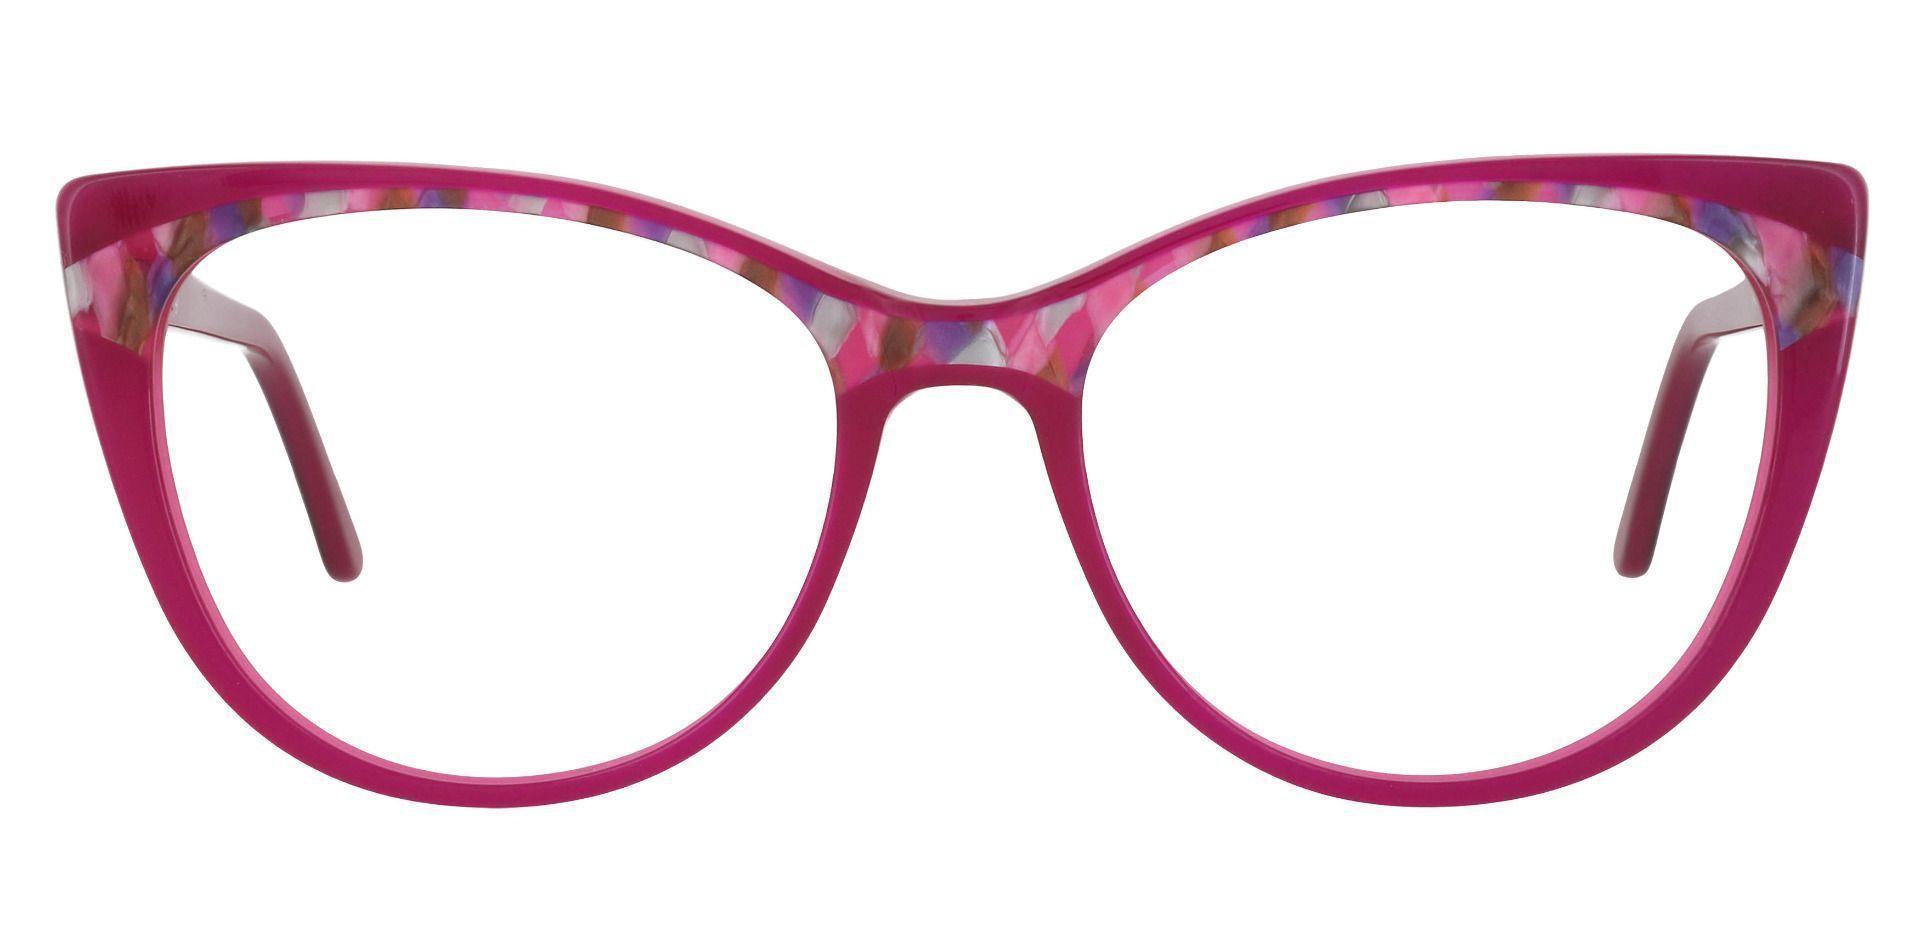 Cabernet Cat Eye Prescription Glasses - Pink